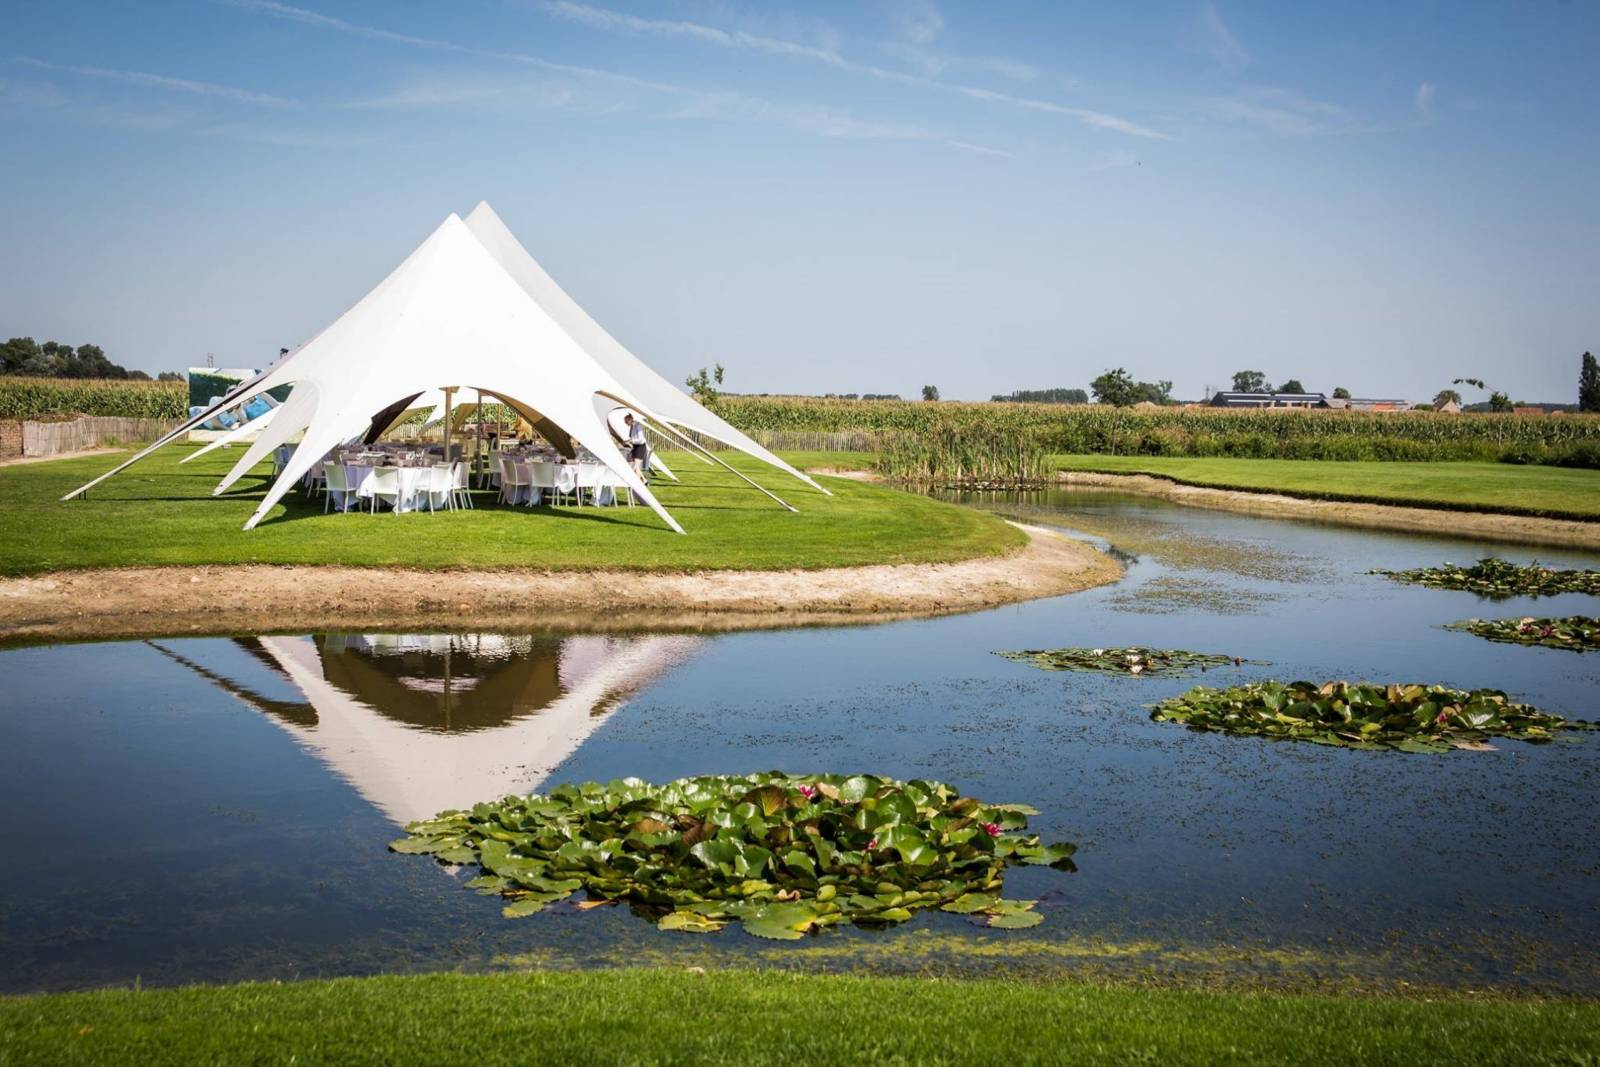 House of Weddings Domein t Eikennest Feestzaal West-Vlaanderen Diksmuide Beerst Tuin Park Vijver Tent Ceremonie Schuur polder (1)